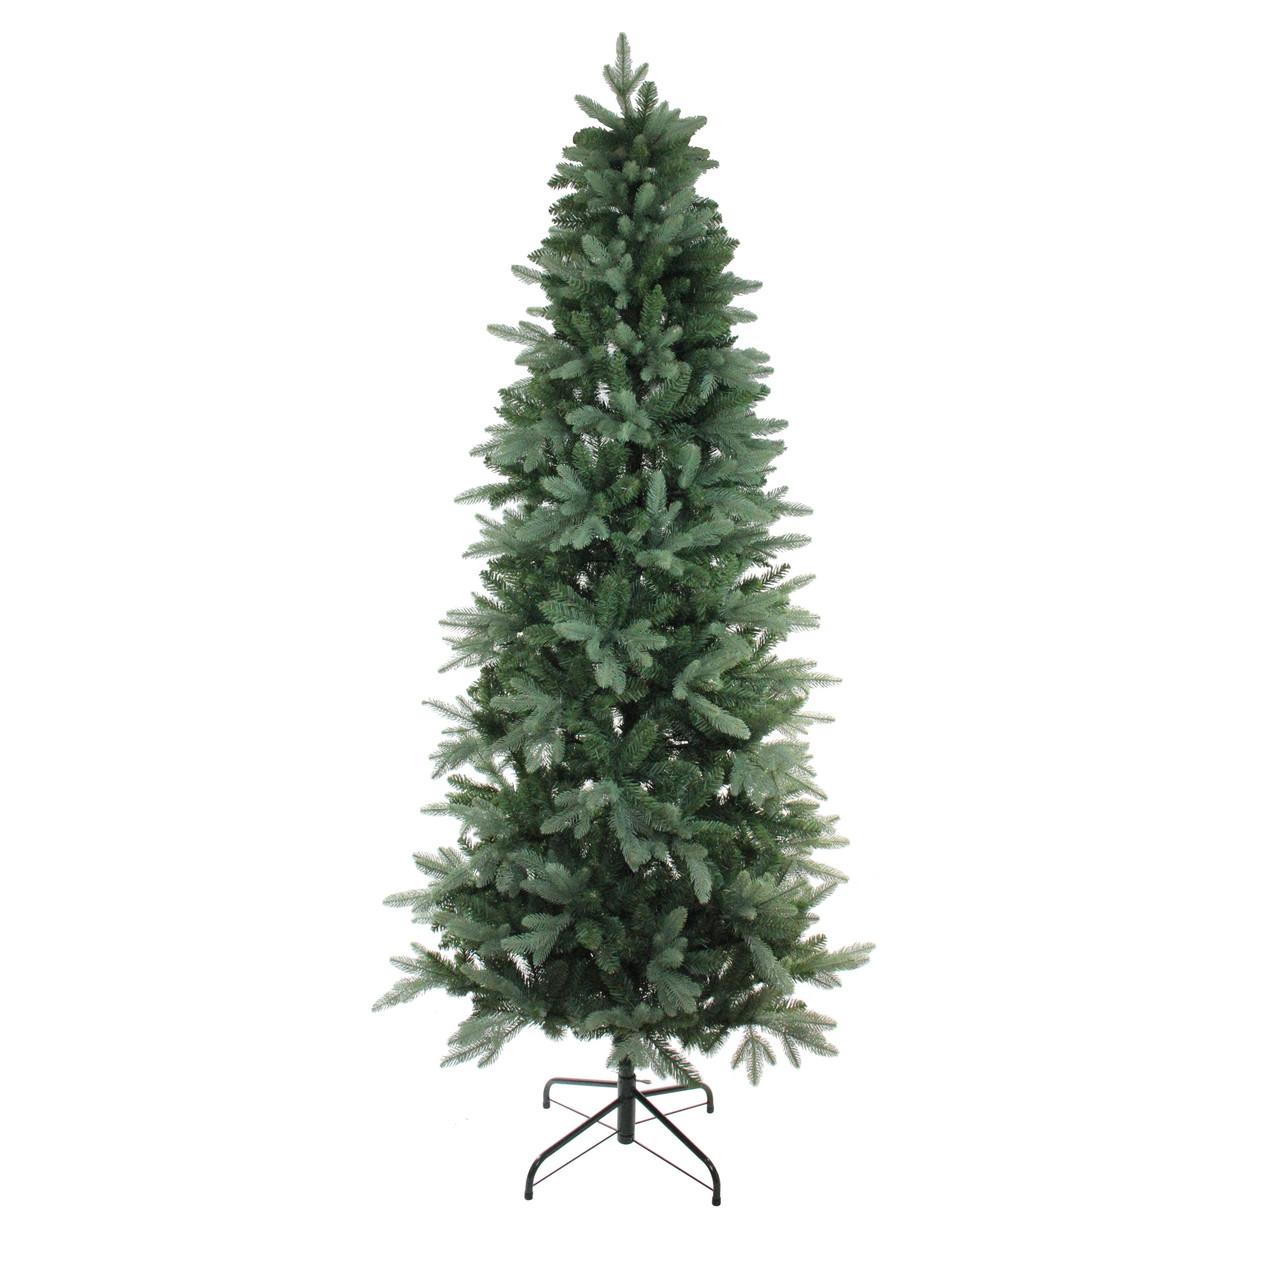 Frasier Fir Christmas Tree.9 X 49 Washington Frasier Fir Slim Artificial Christmas Tree Unlit 32635561